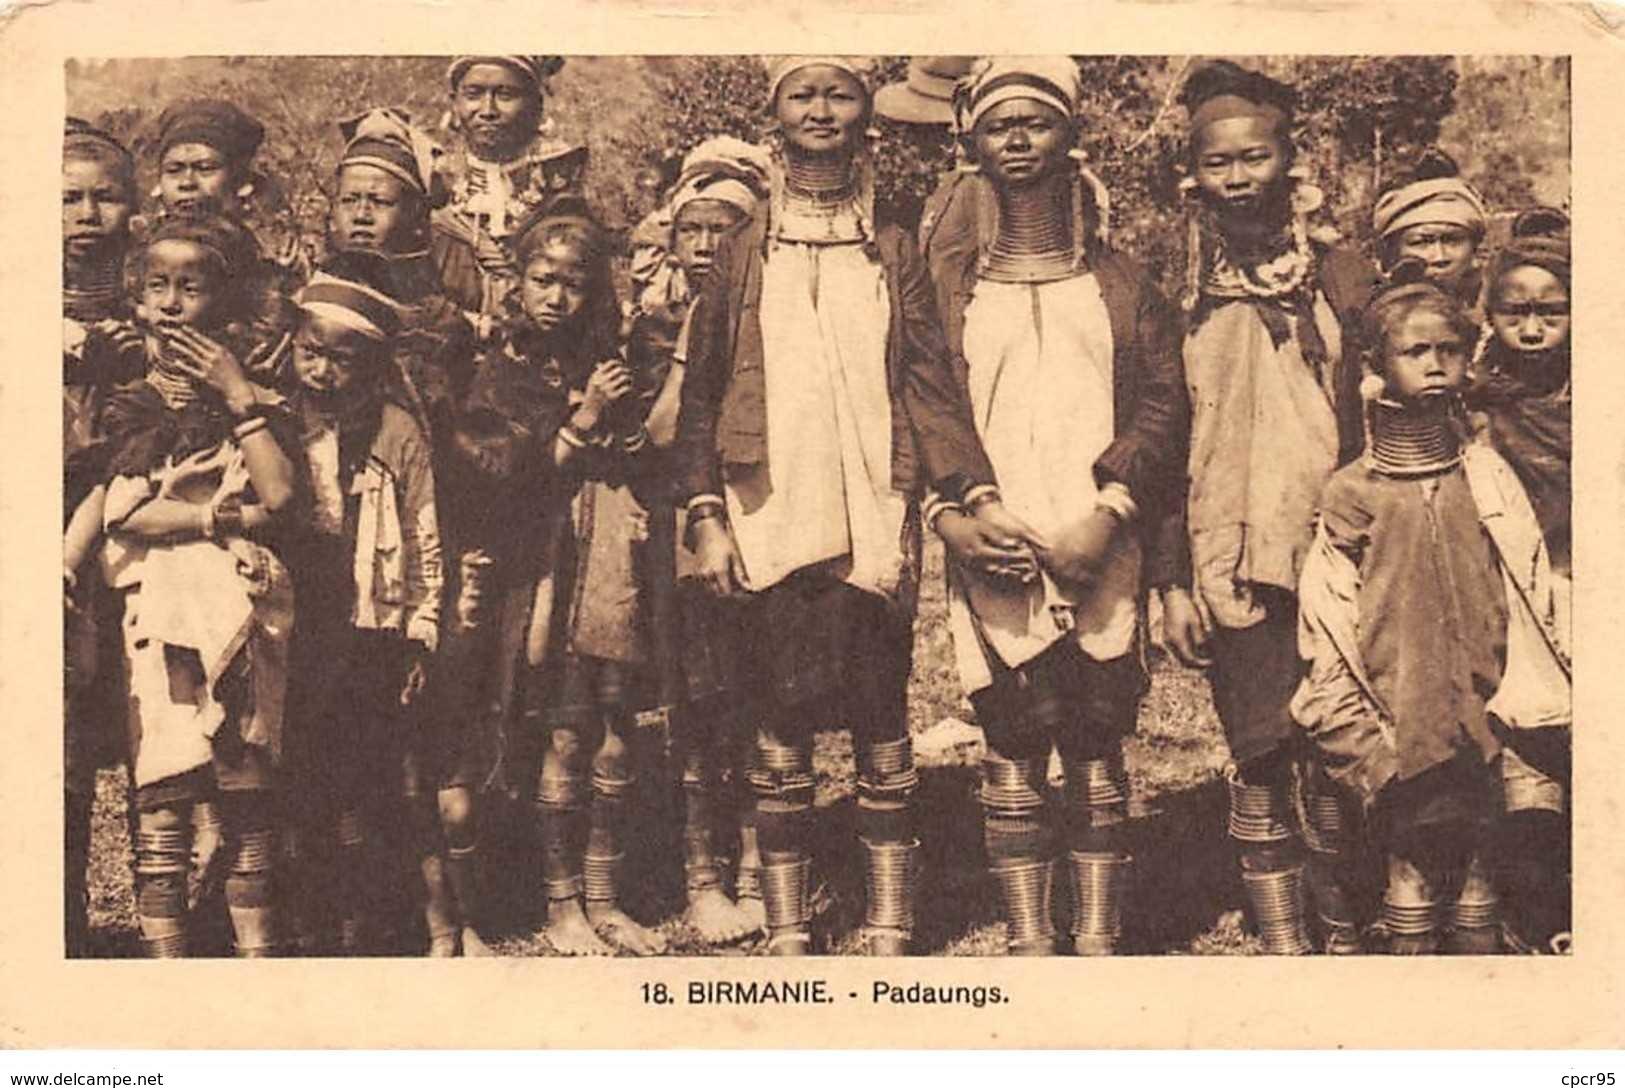 Myanmar - N°61493 - BIRMANIE - Padaungs - Soeurs De St-Joseph De L'apparition N°18 - Myanmar (Birma)